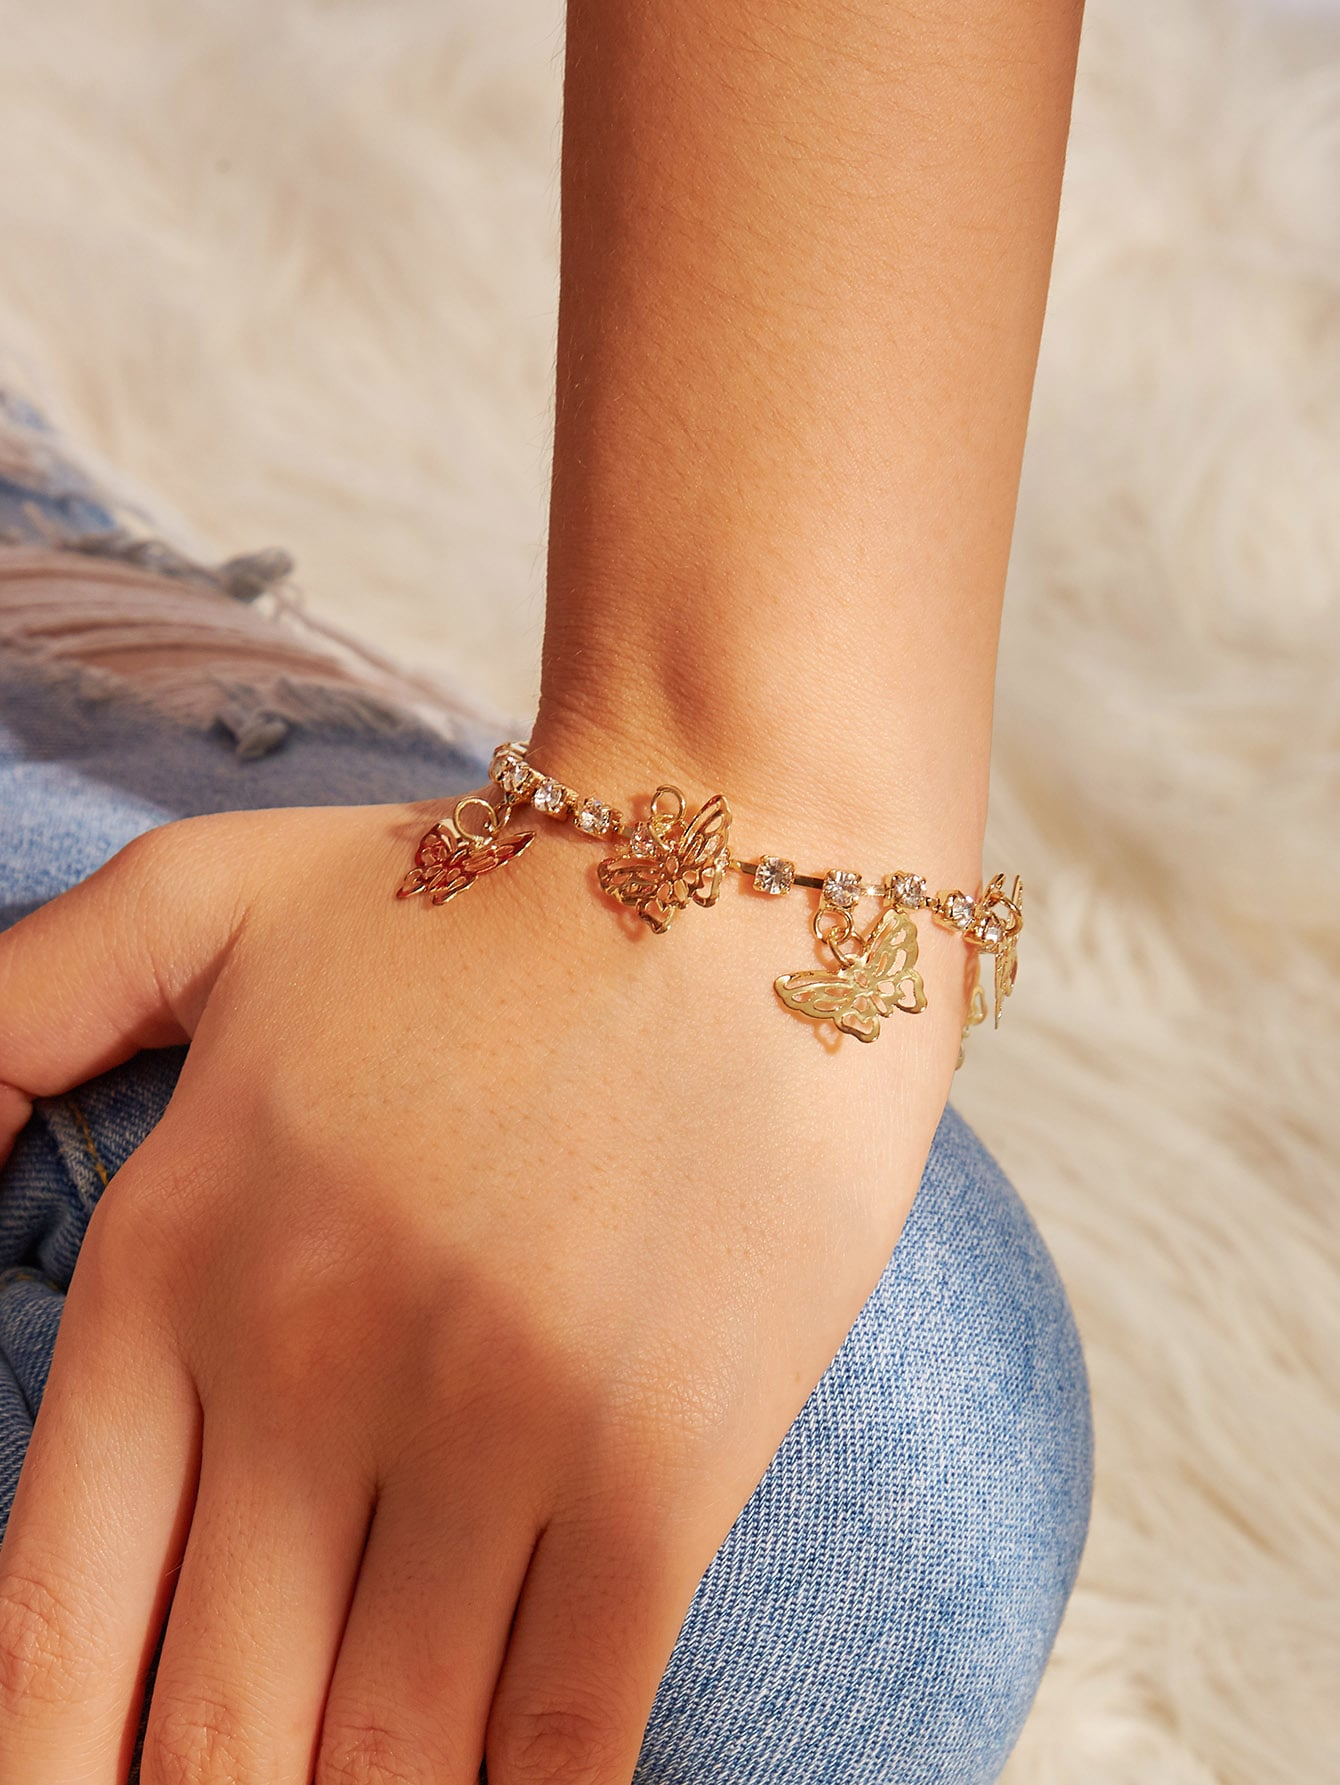 Фото - Браслет с бриллиантами и стразами 1шт от SheIn цвет золотые